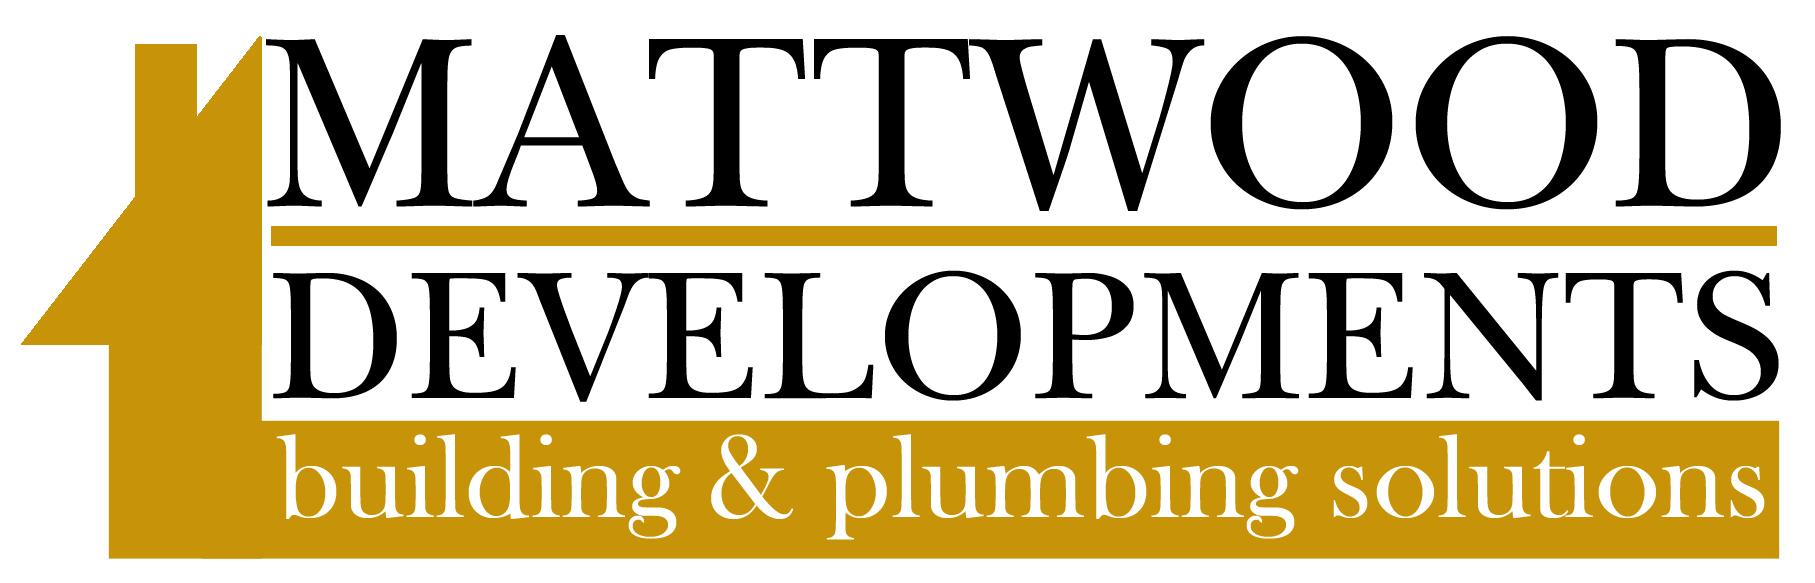 Mattwood Developments